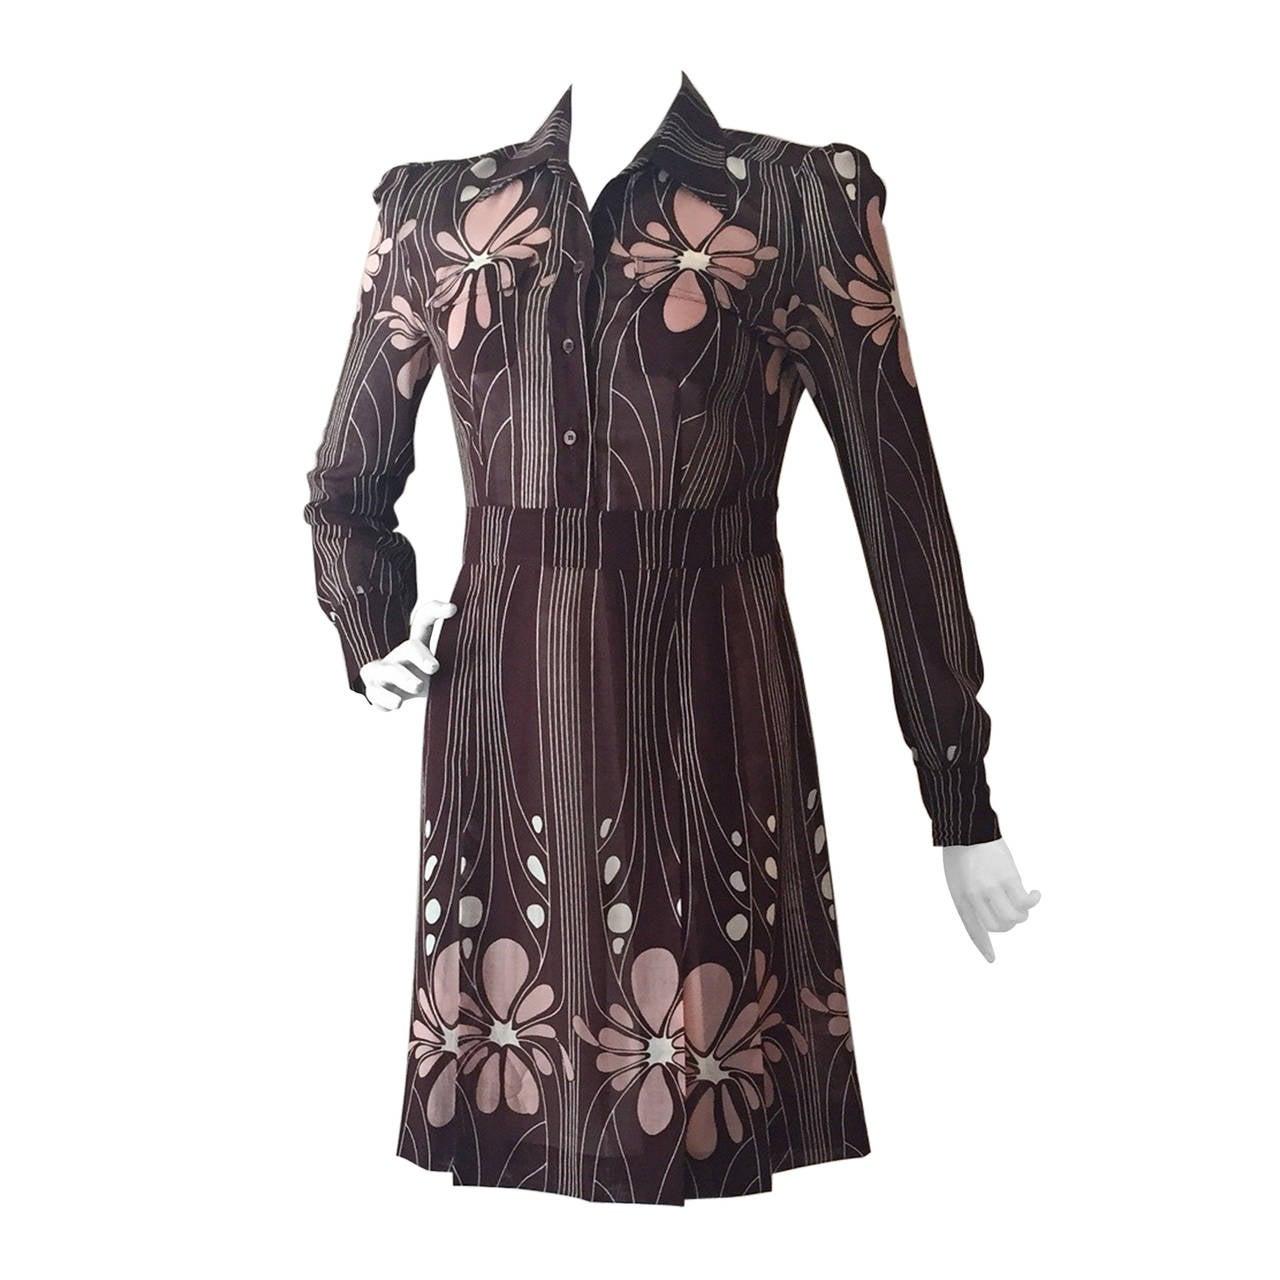 Vintage Miuccia Prada Clothing - 43 For Sale at 1stdibs a27d9d5e9f226